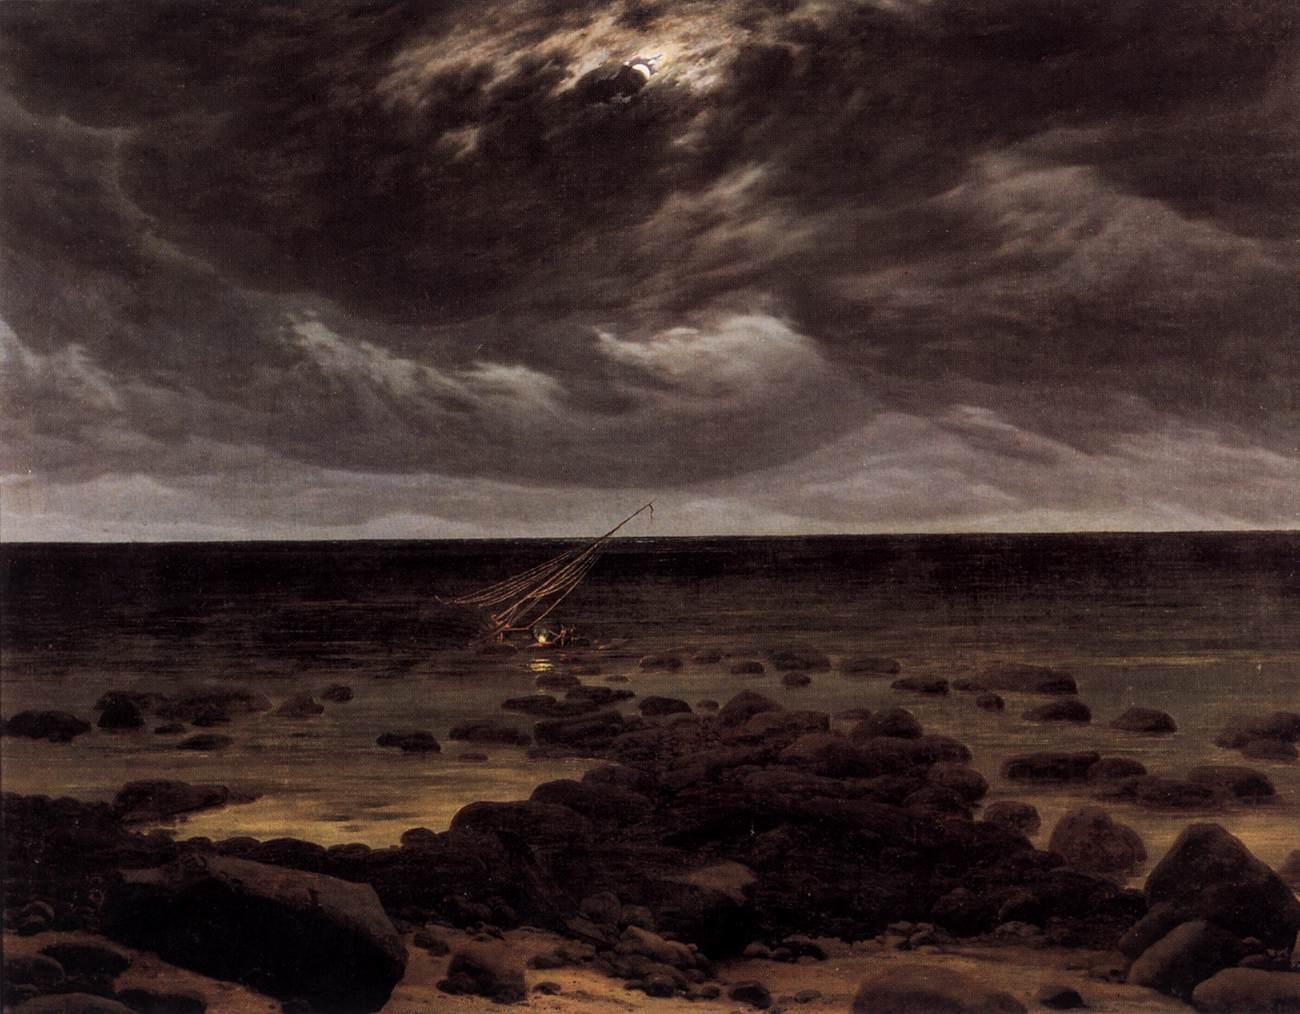 Meeresküste bei Mondschein /  Seashore by Moonlight. Work is public domain and from Wiki Commons.